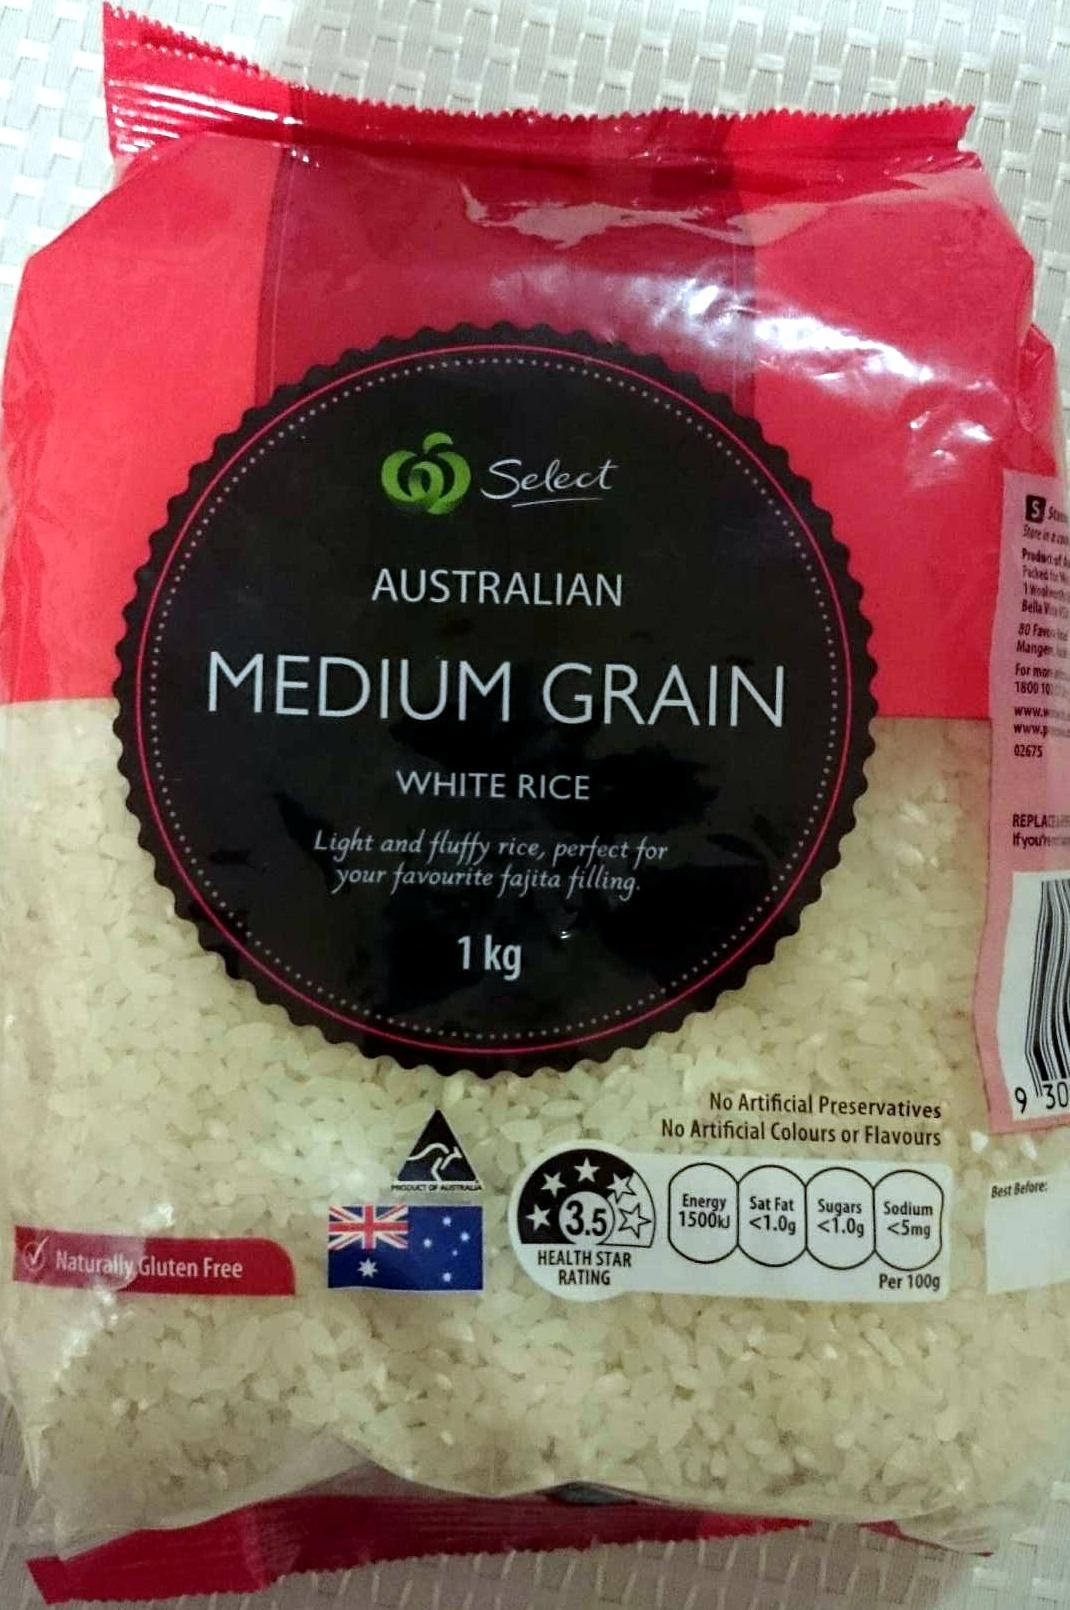 Australian Medium Grain White Rice - Product - en